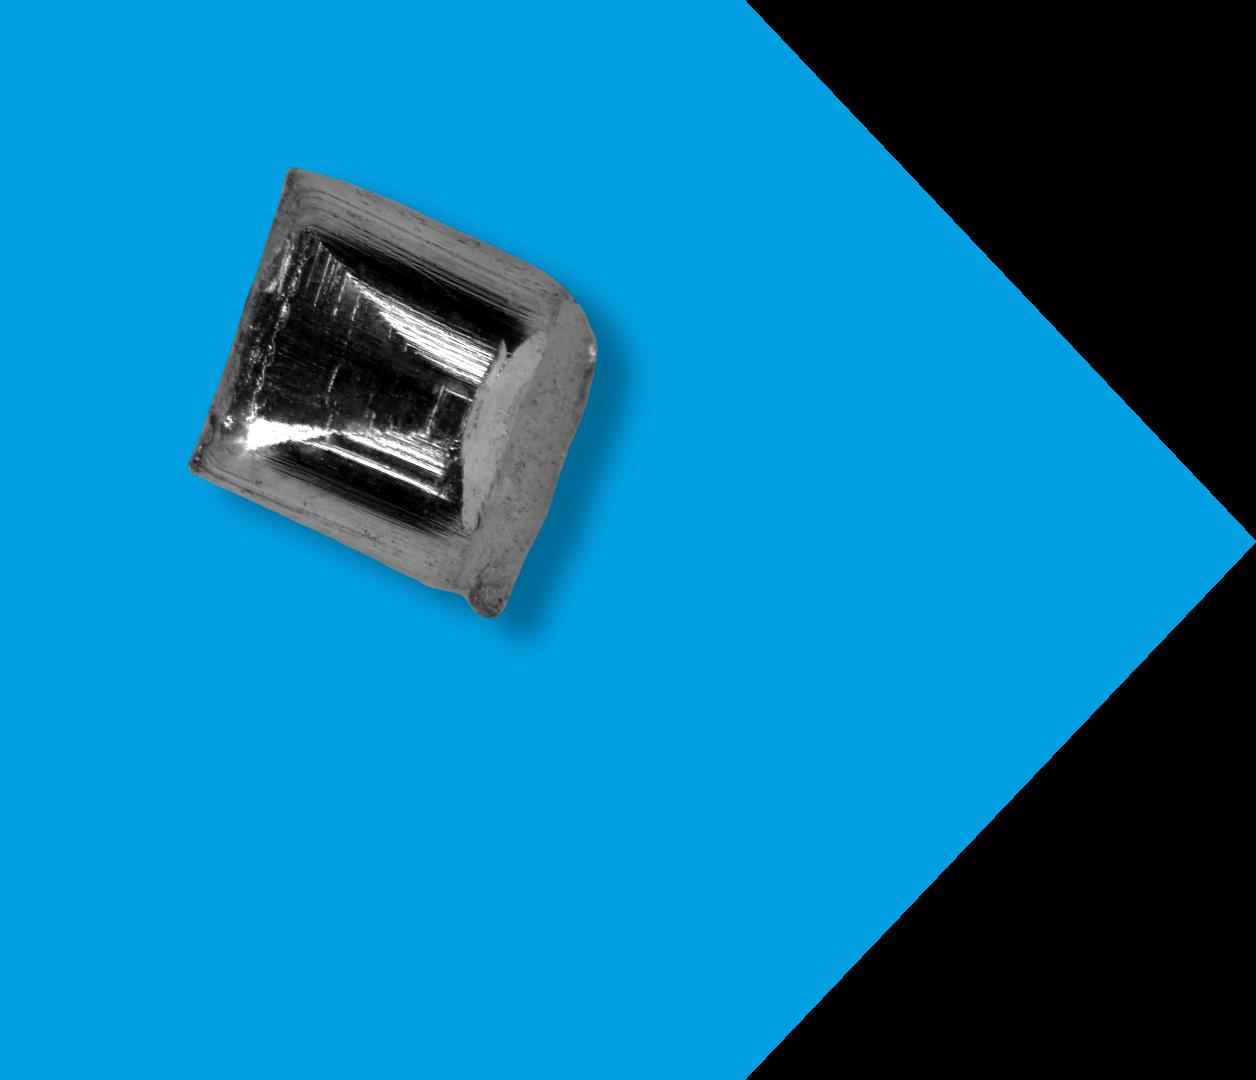 Transparent Aluminium Aluminium Cut Wire Rigorous Blasting Performance And Long